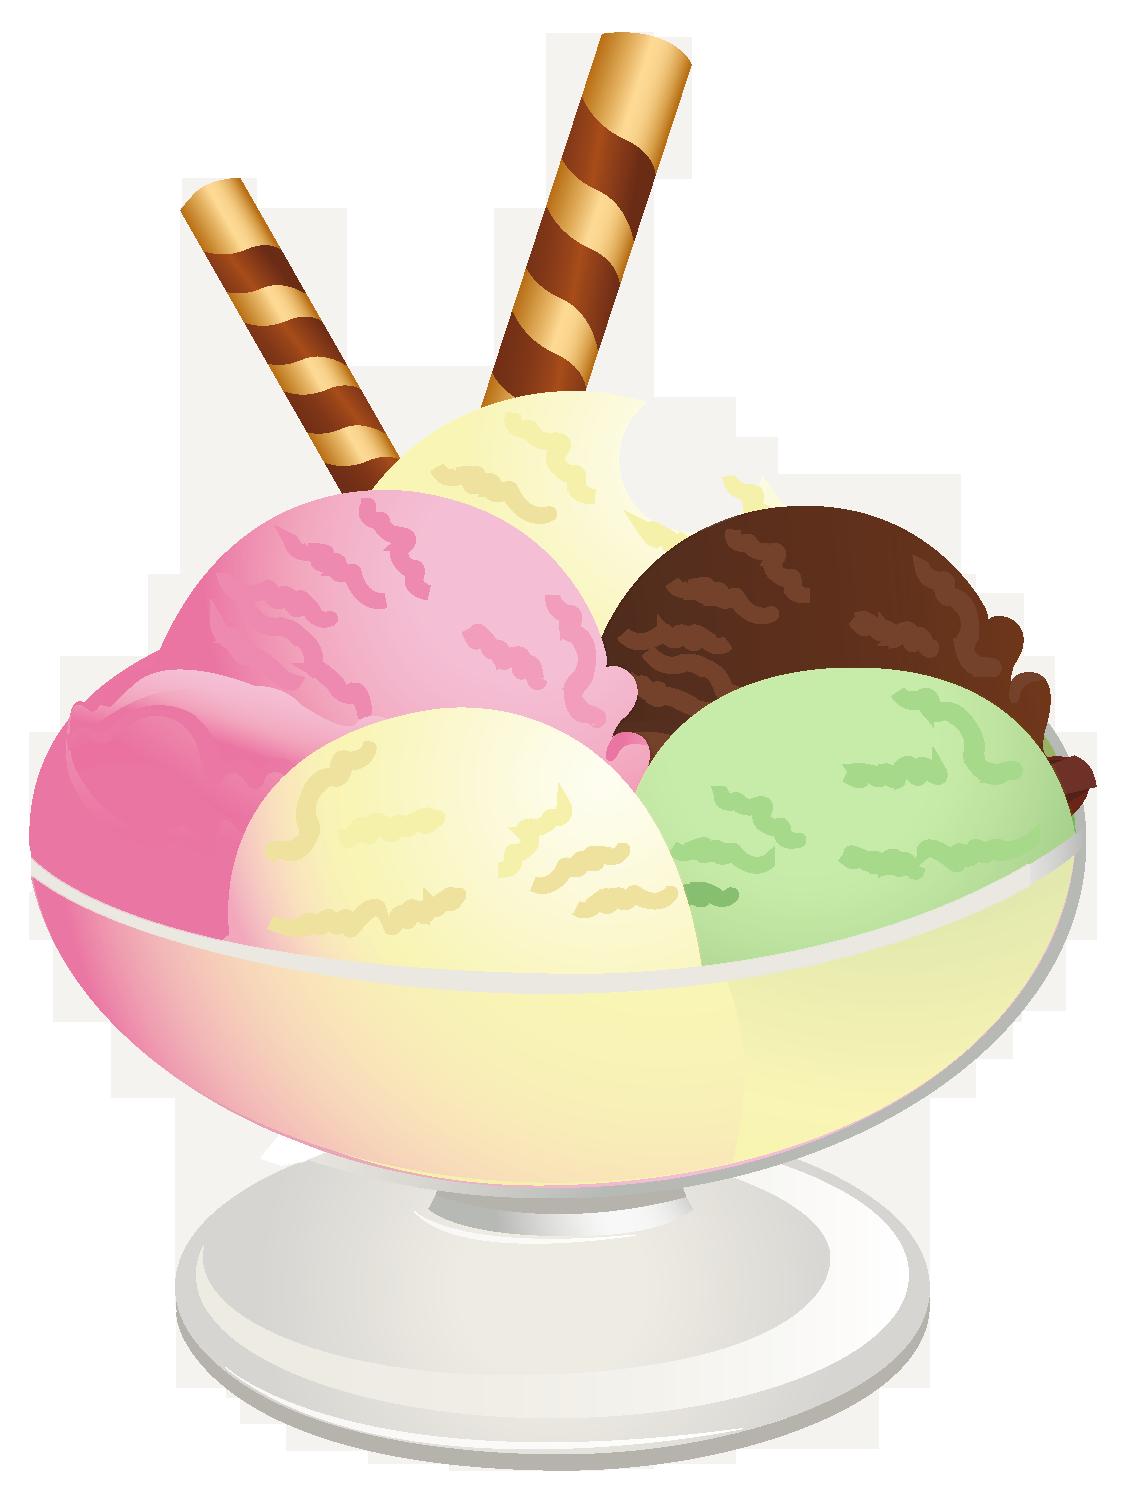 banner royalty free  amazing ice cream. Sundae clipart gelato italian